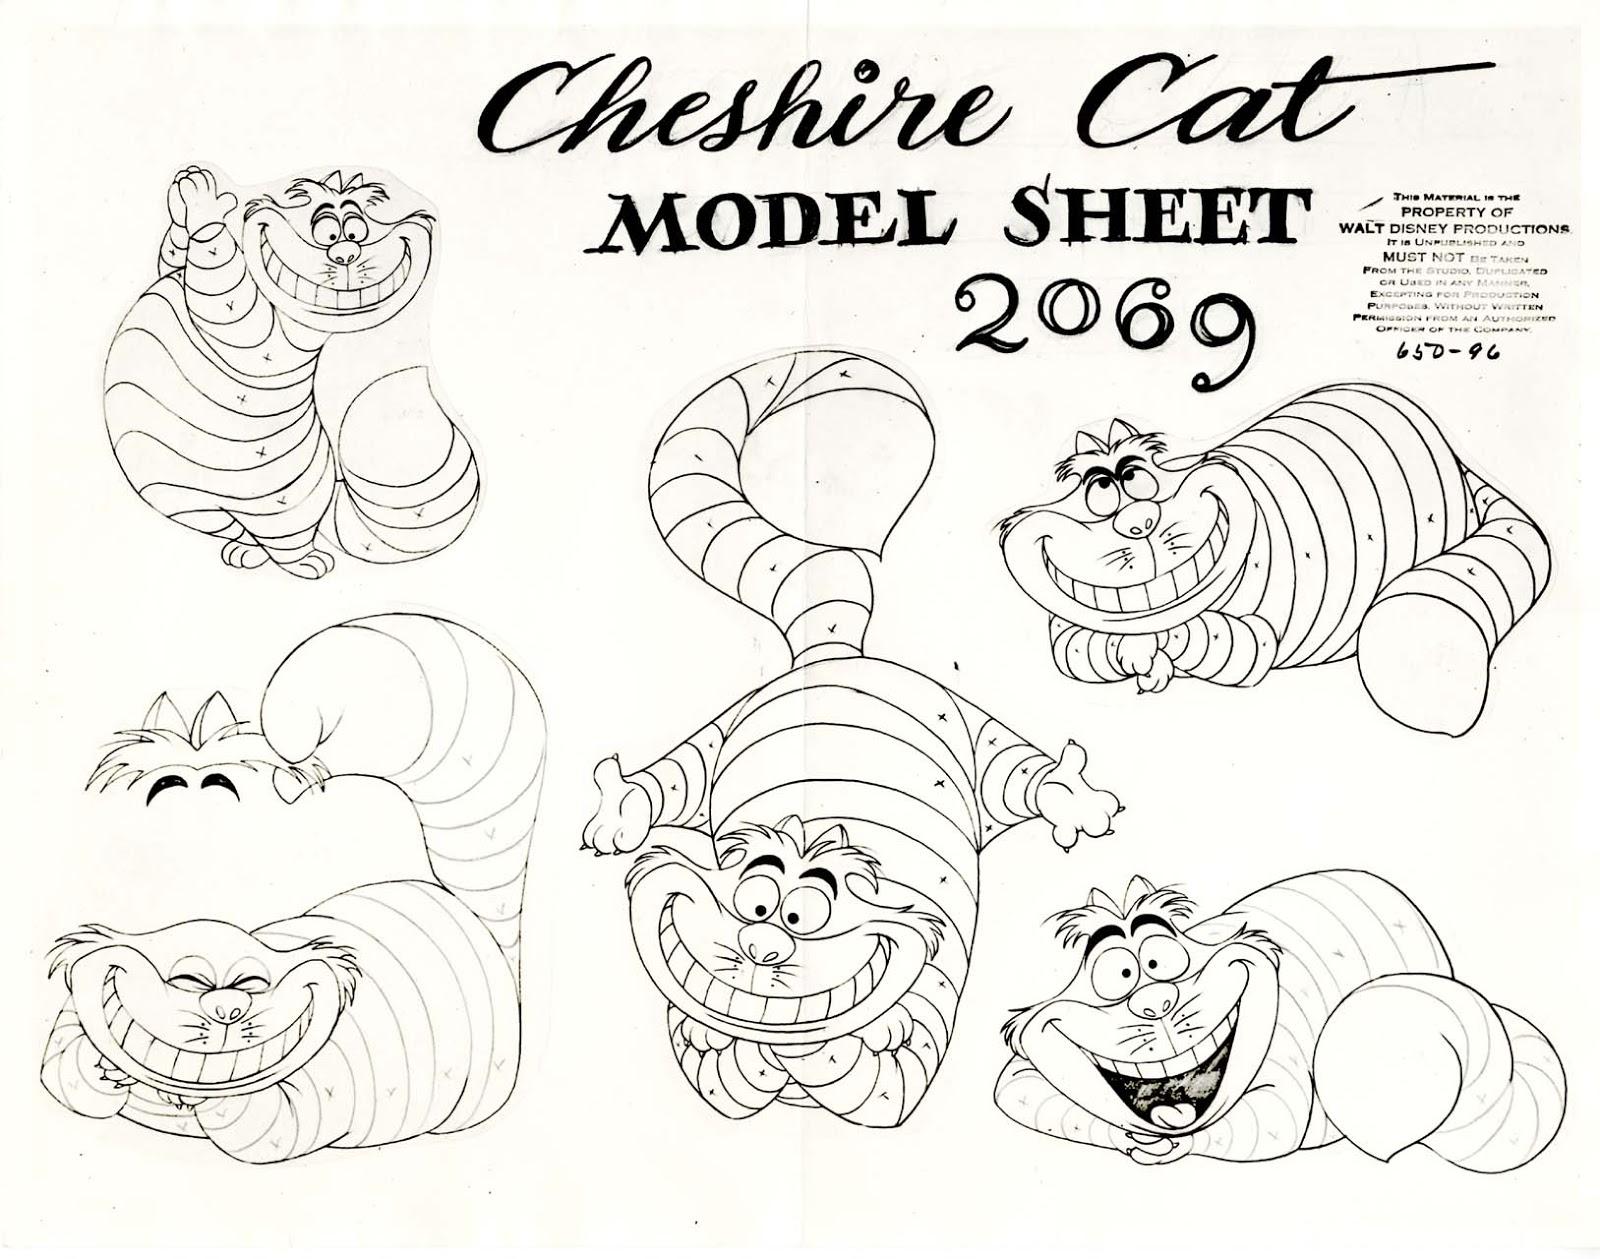 Drawn cheshire cat disney Wiki Fandom Model by Cheshire